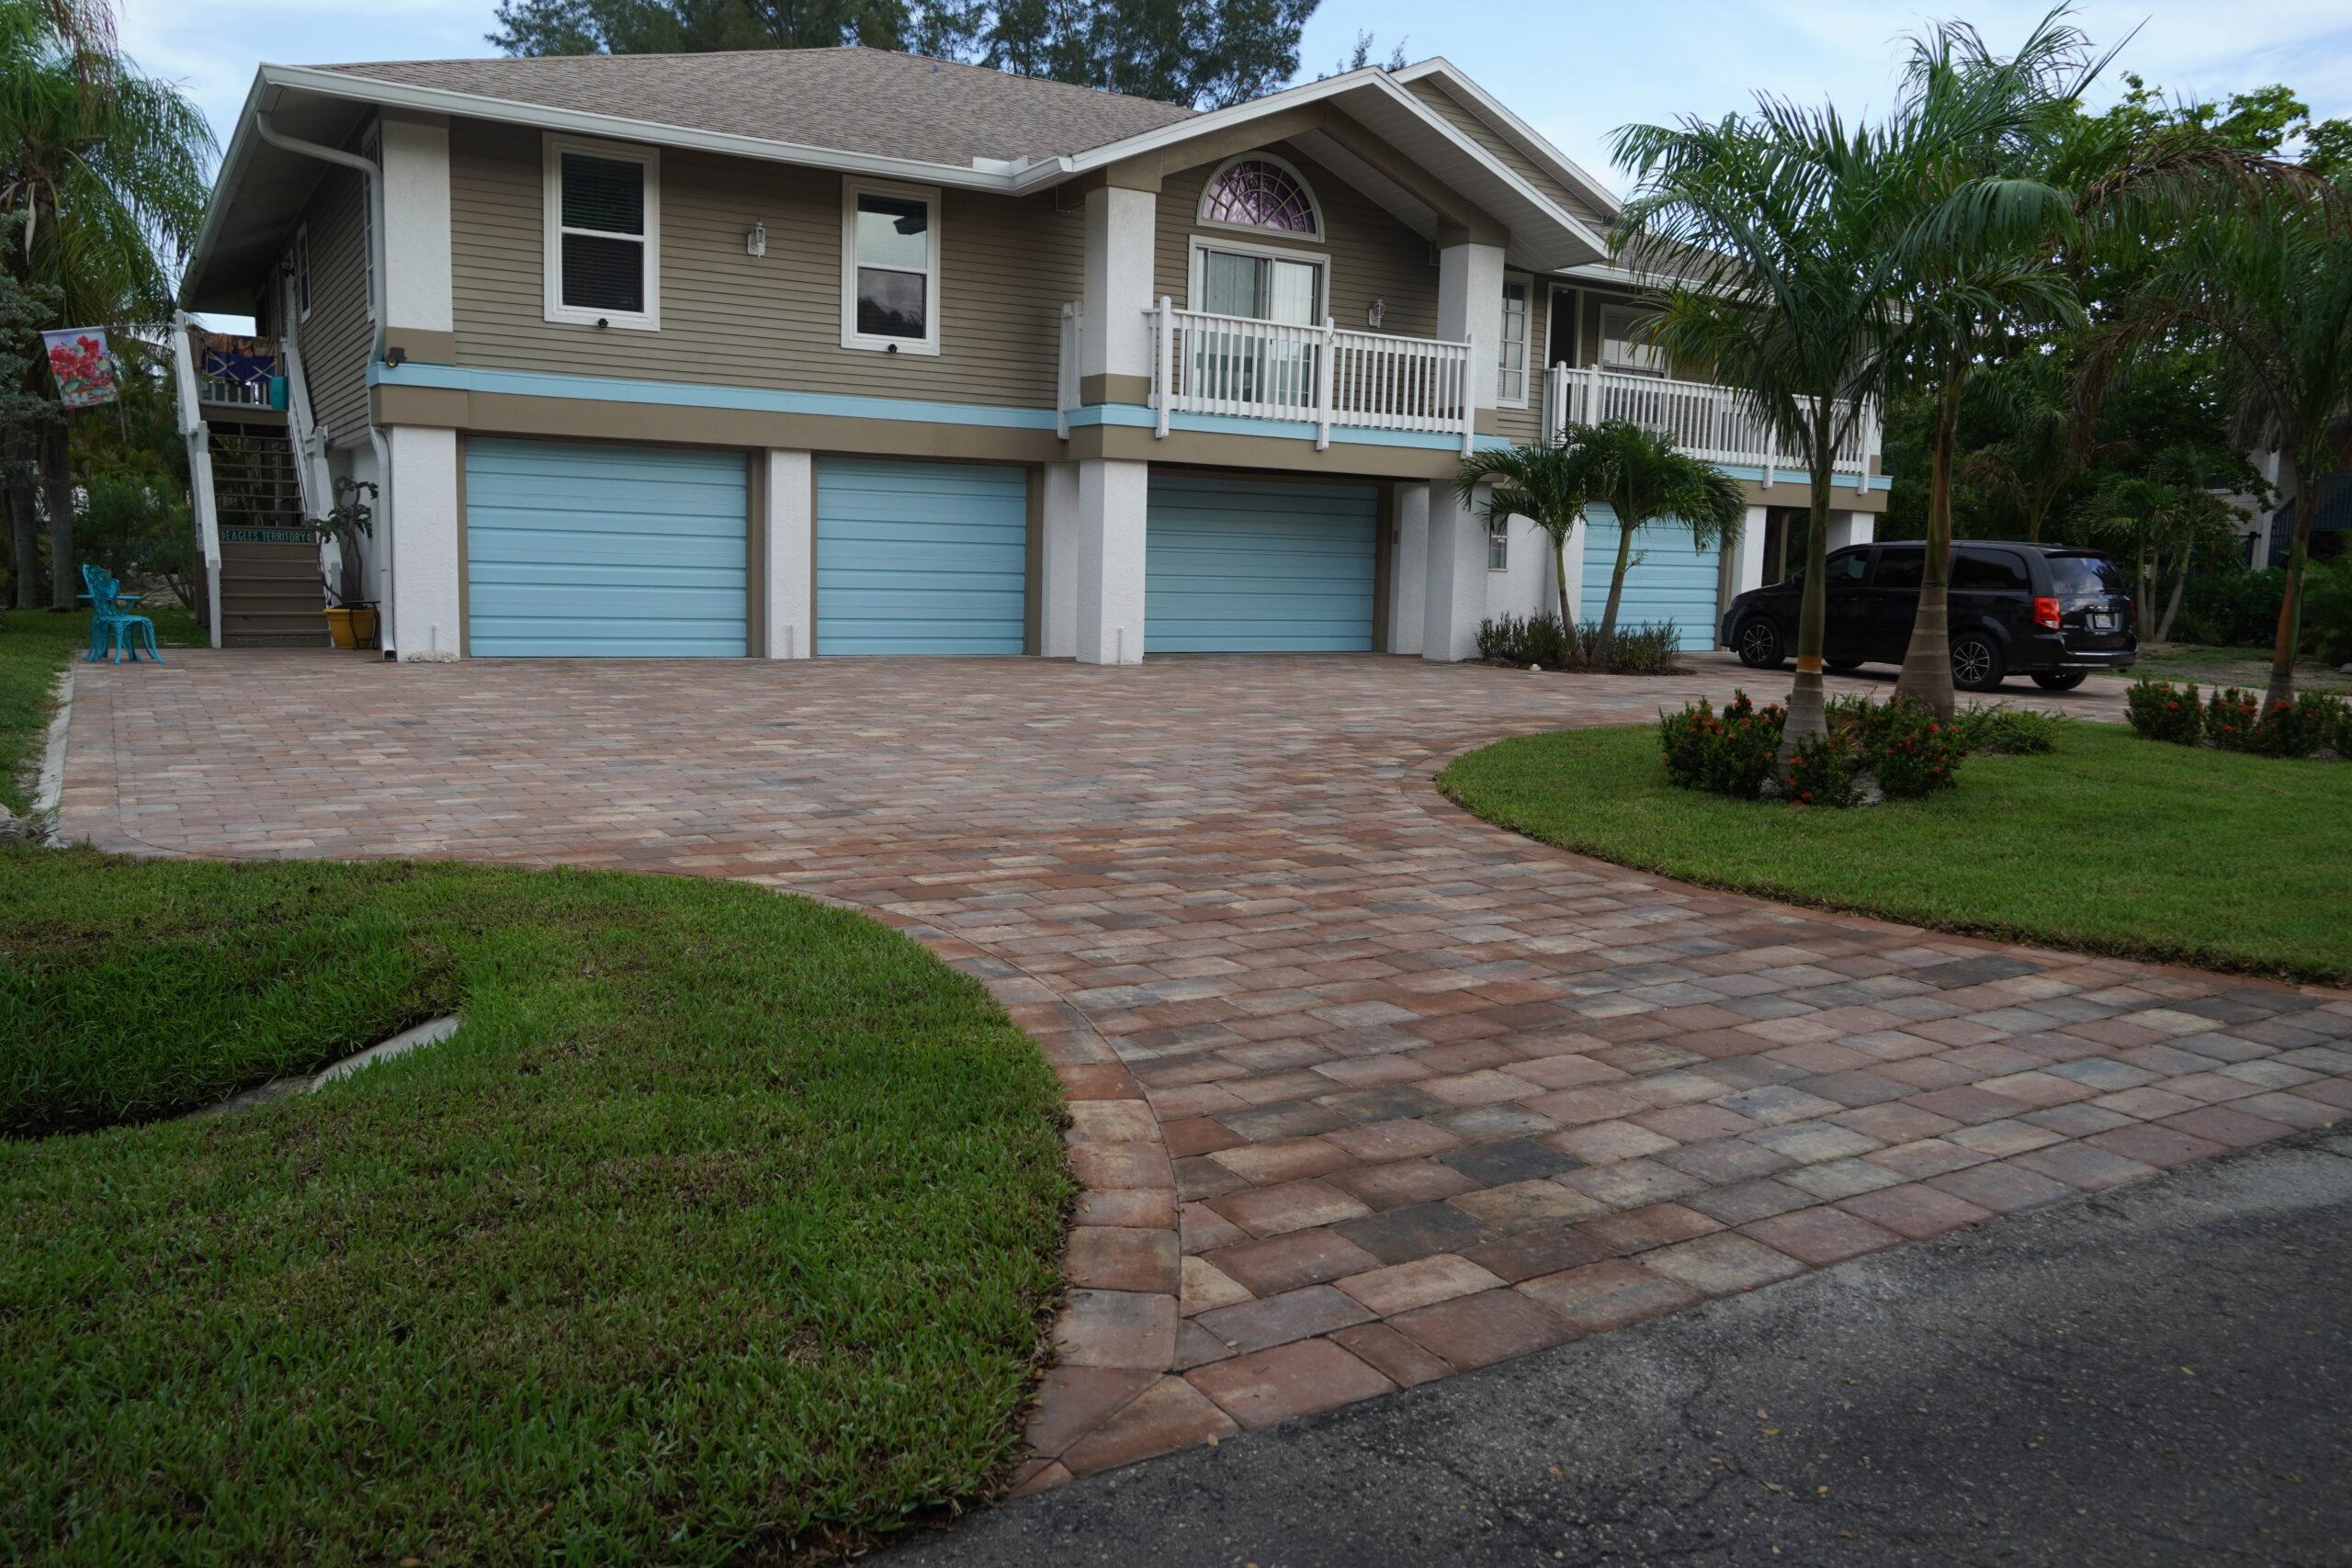 New Paver Driveway Naples FL – A